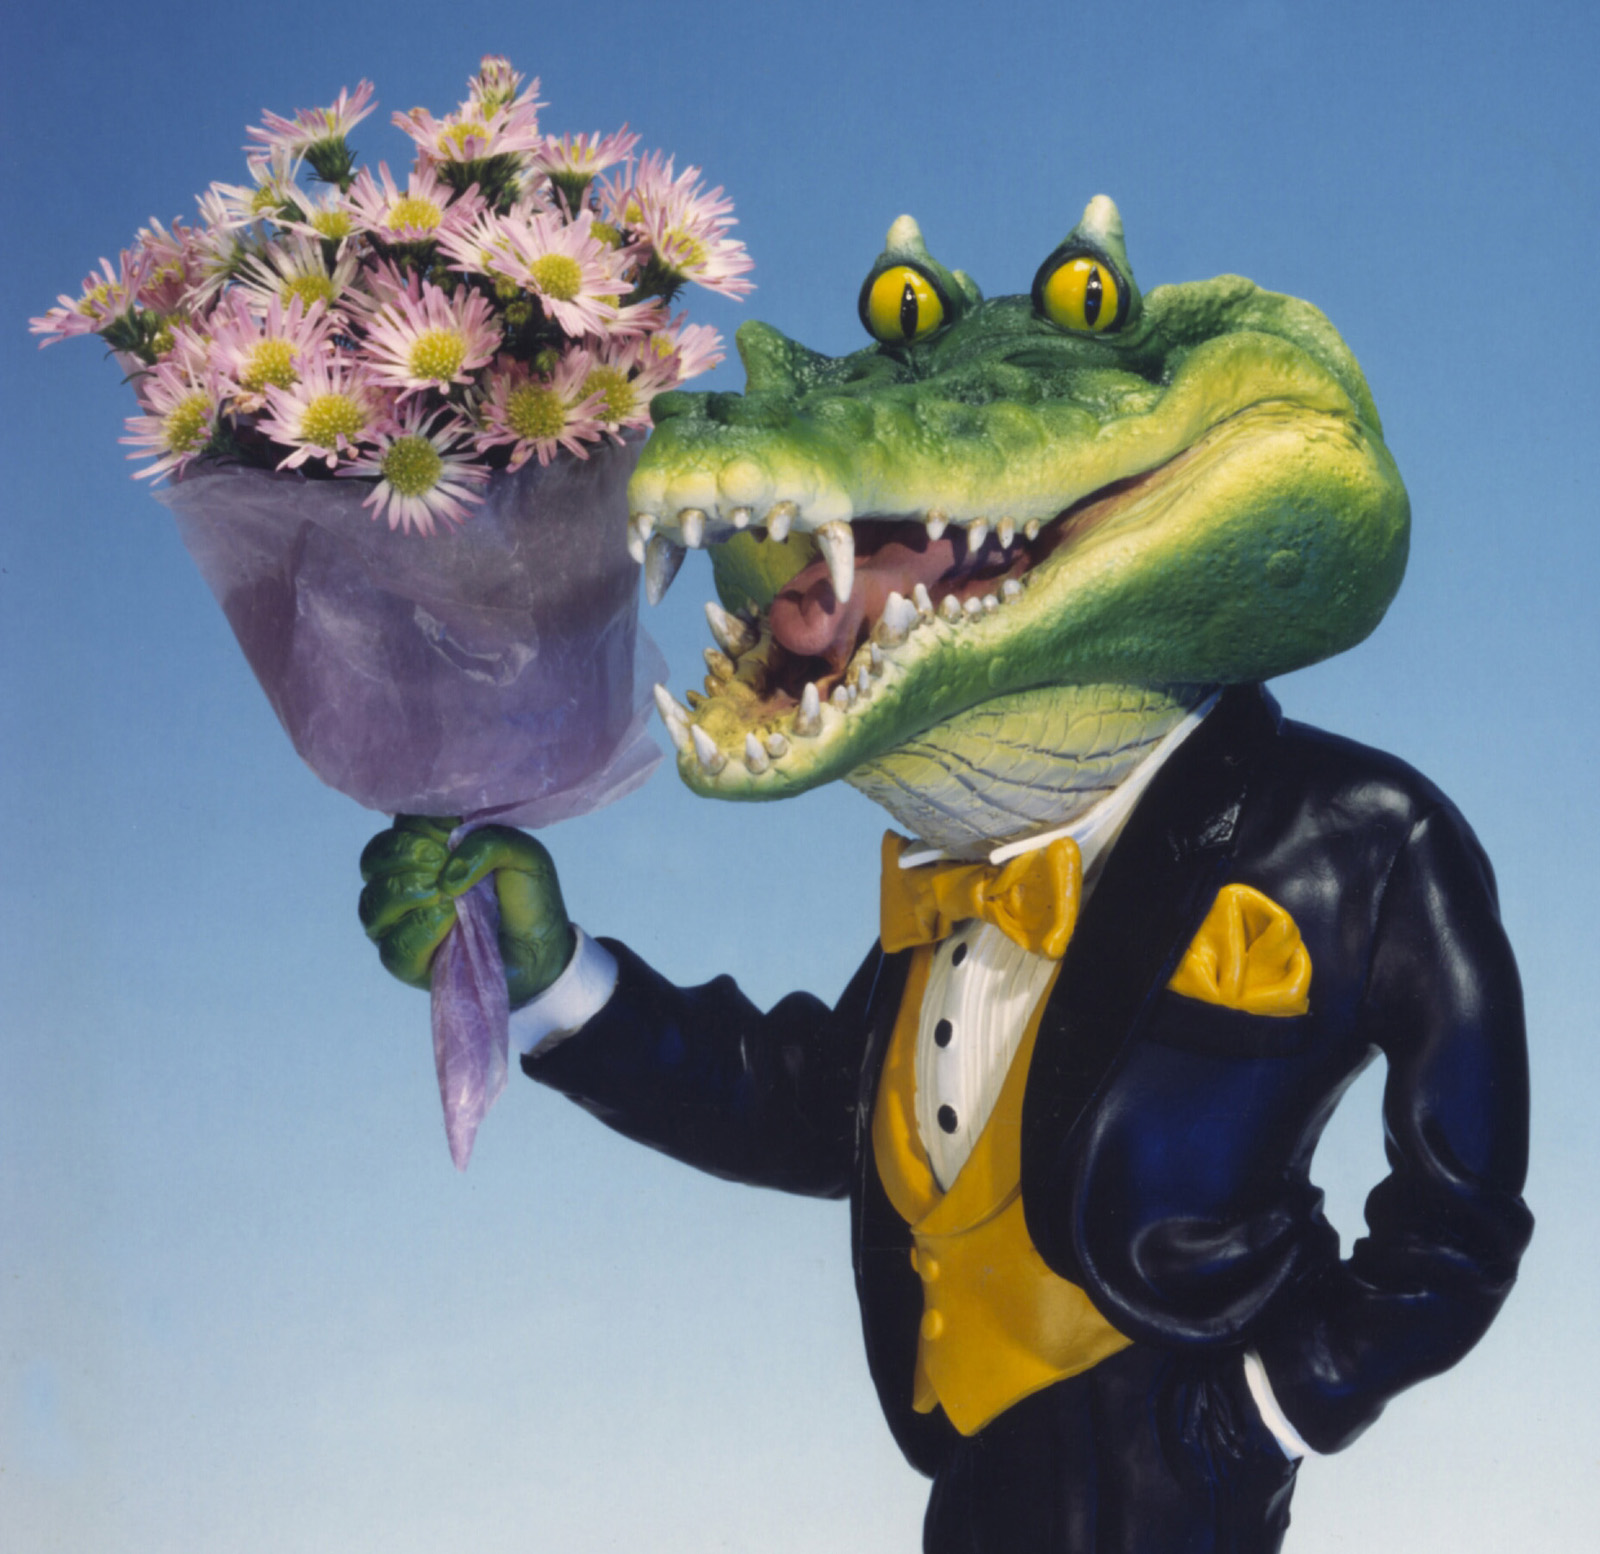 Gingiss Menswear Prom Gator